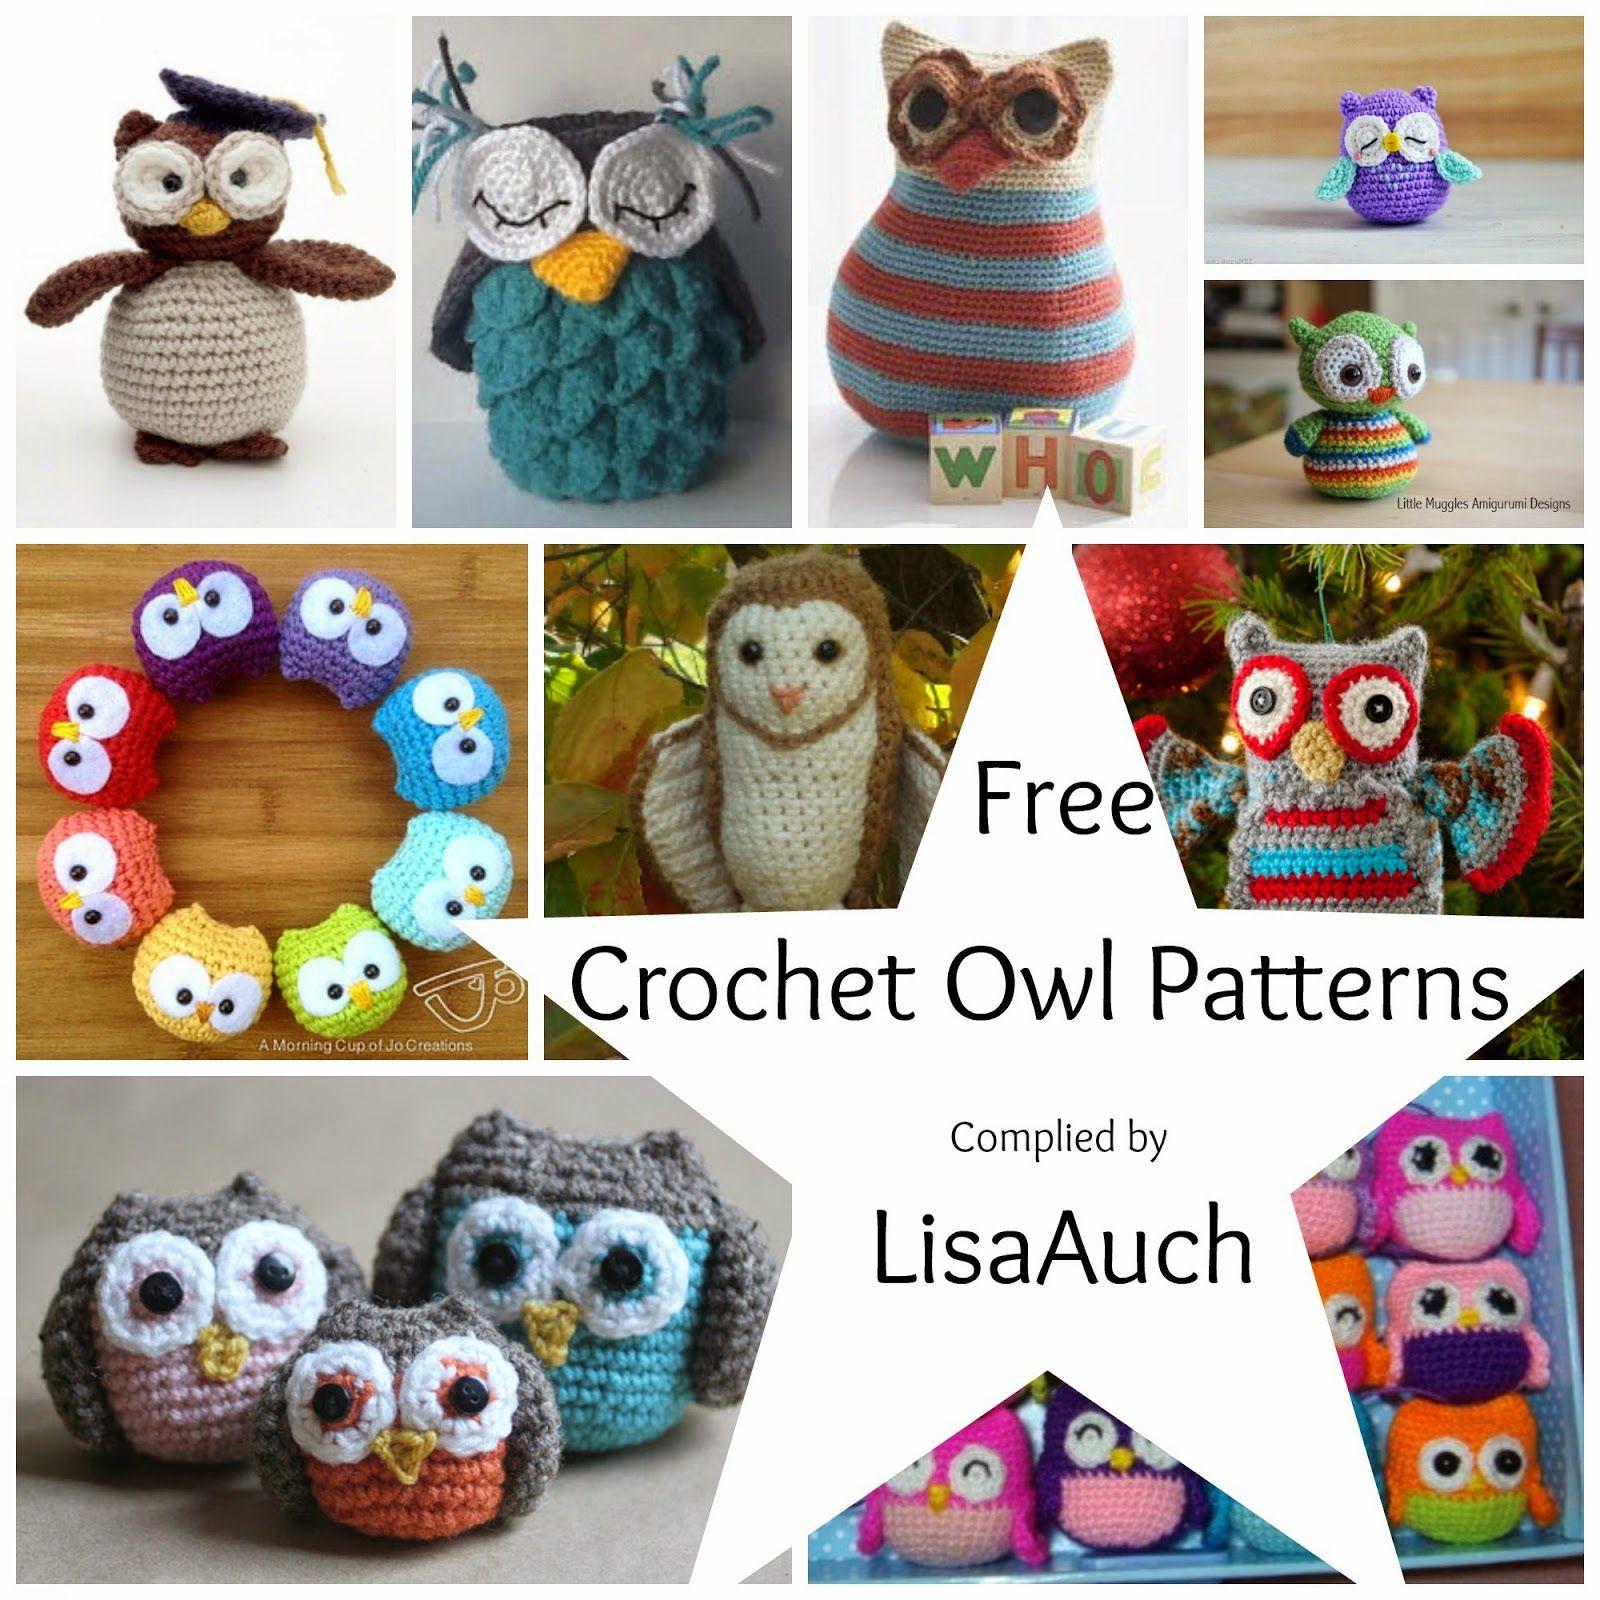 Free Crochet Owl Patterns (FREE Crochet Patterns) | Pinterest | Owl ...